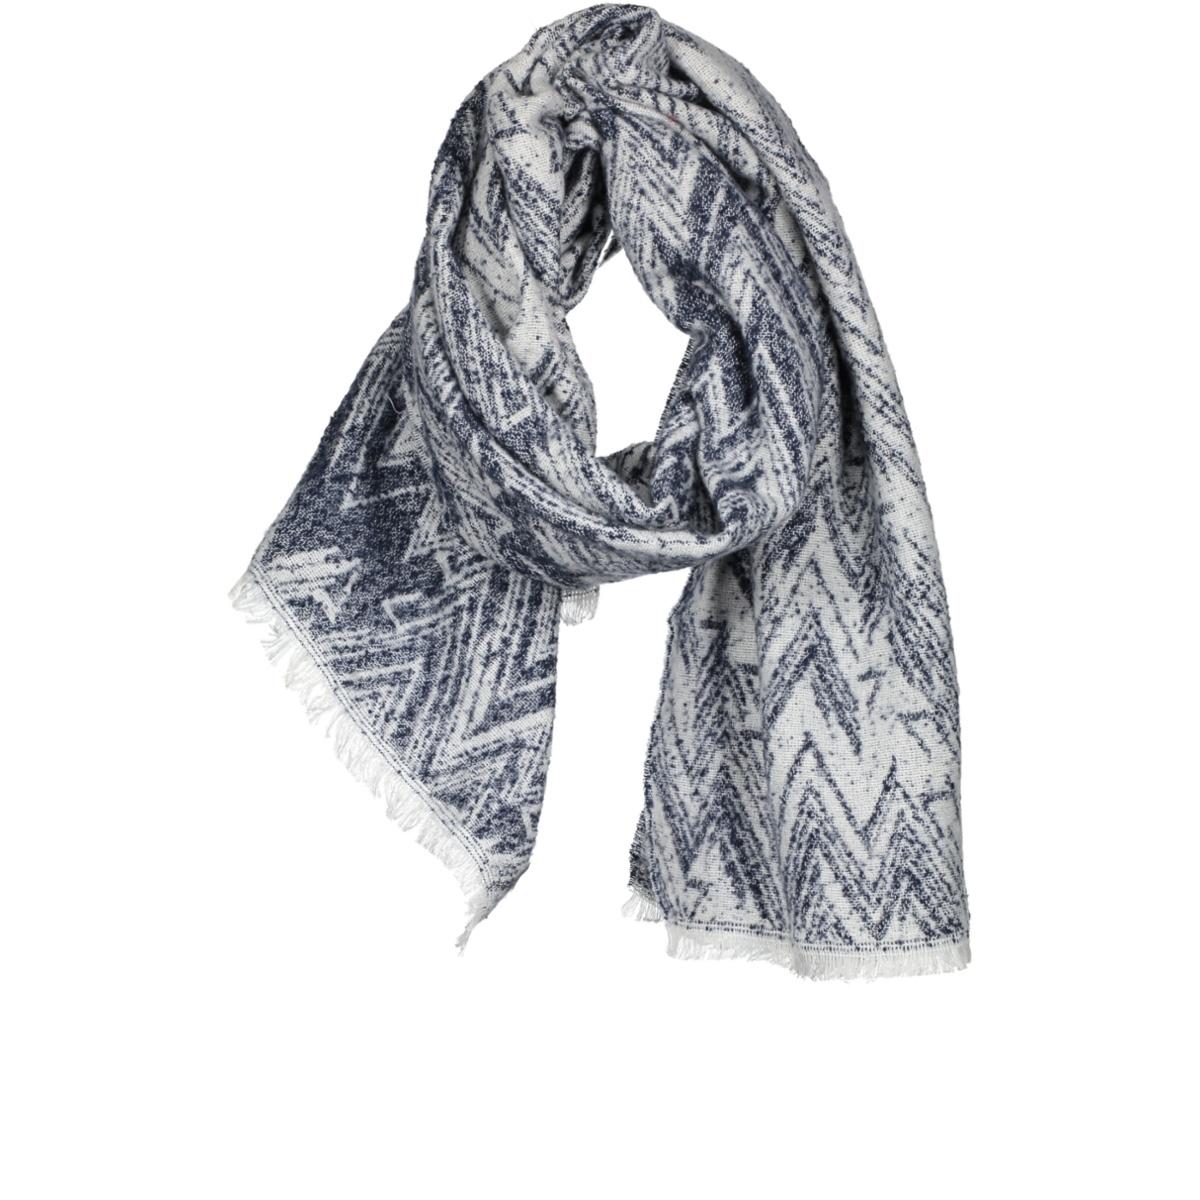 w17.97.5950 amber scarf circle of trust sjaal nighshade